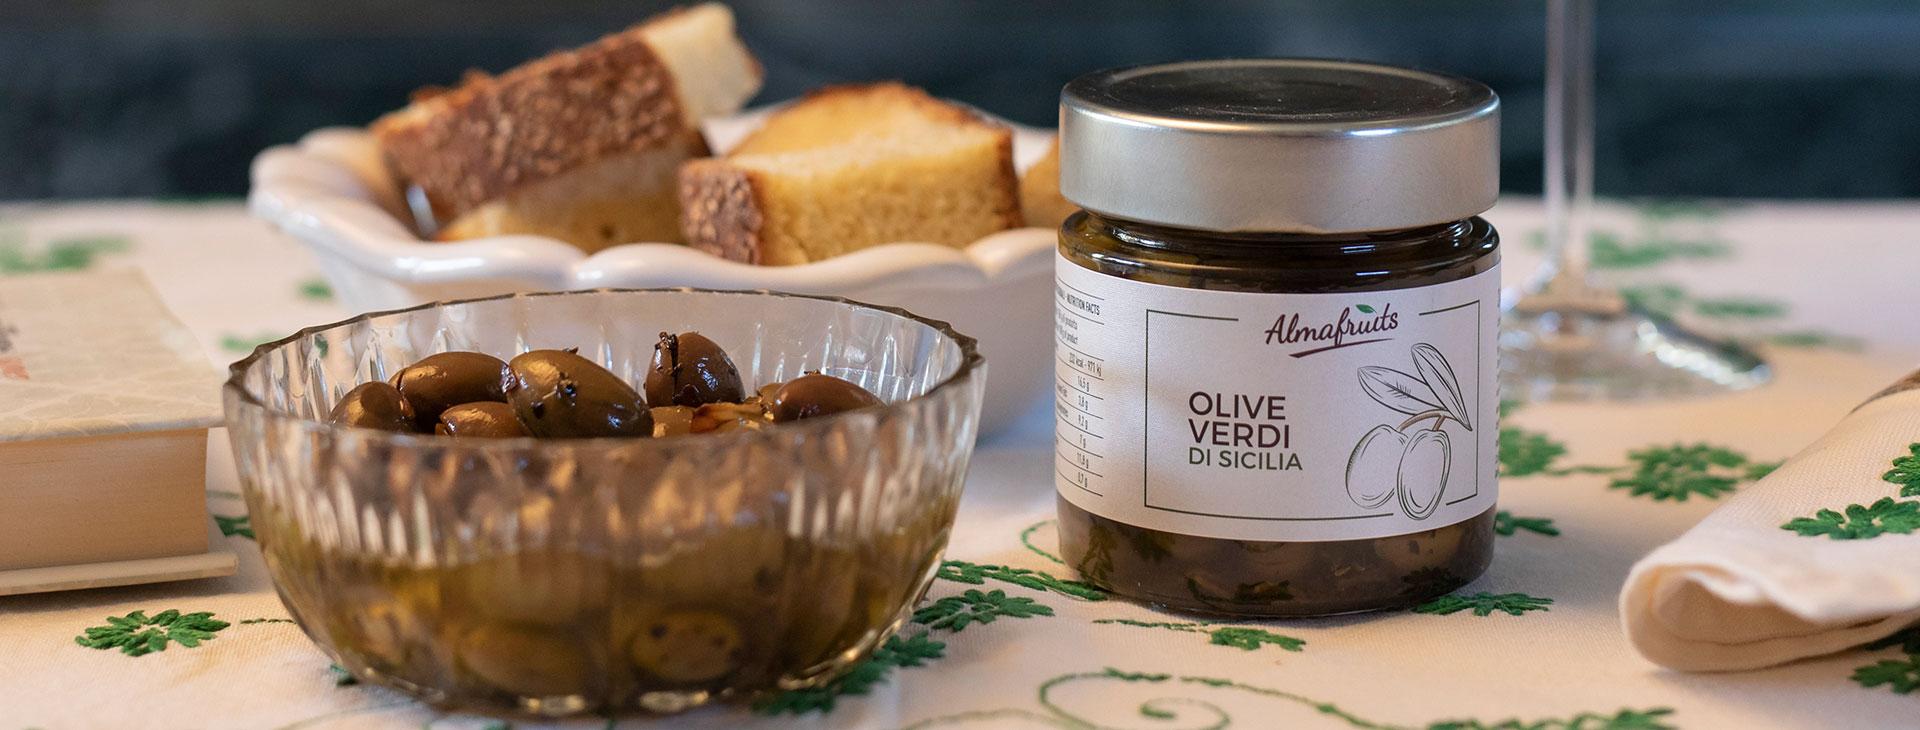 Immagine introduttiva raffigurante olive verdi